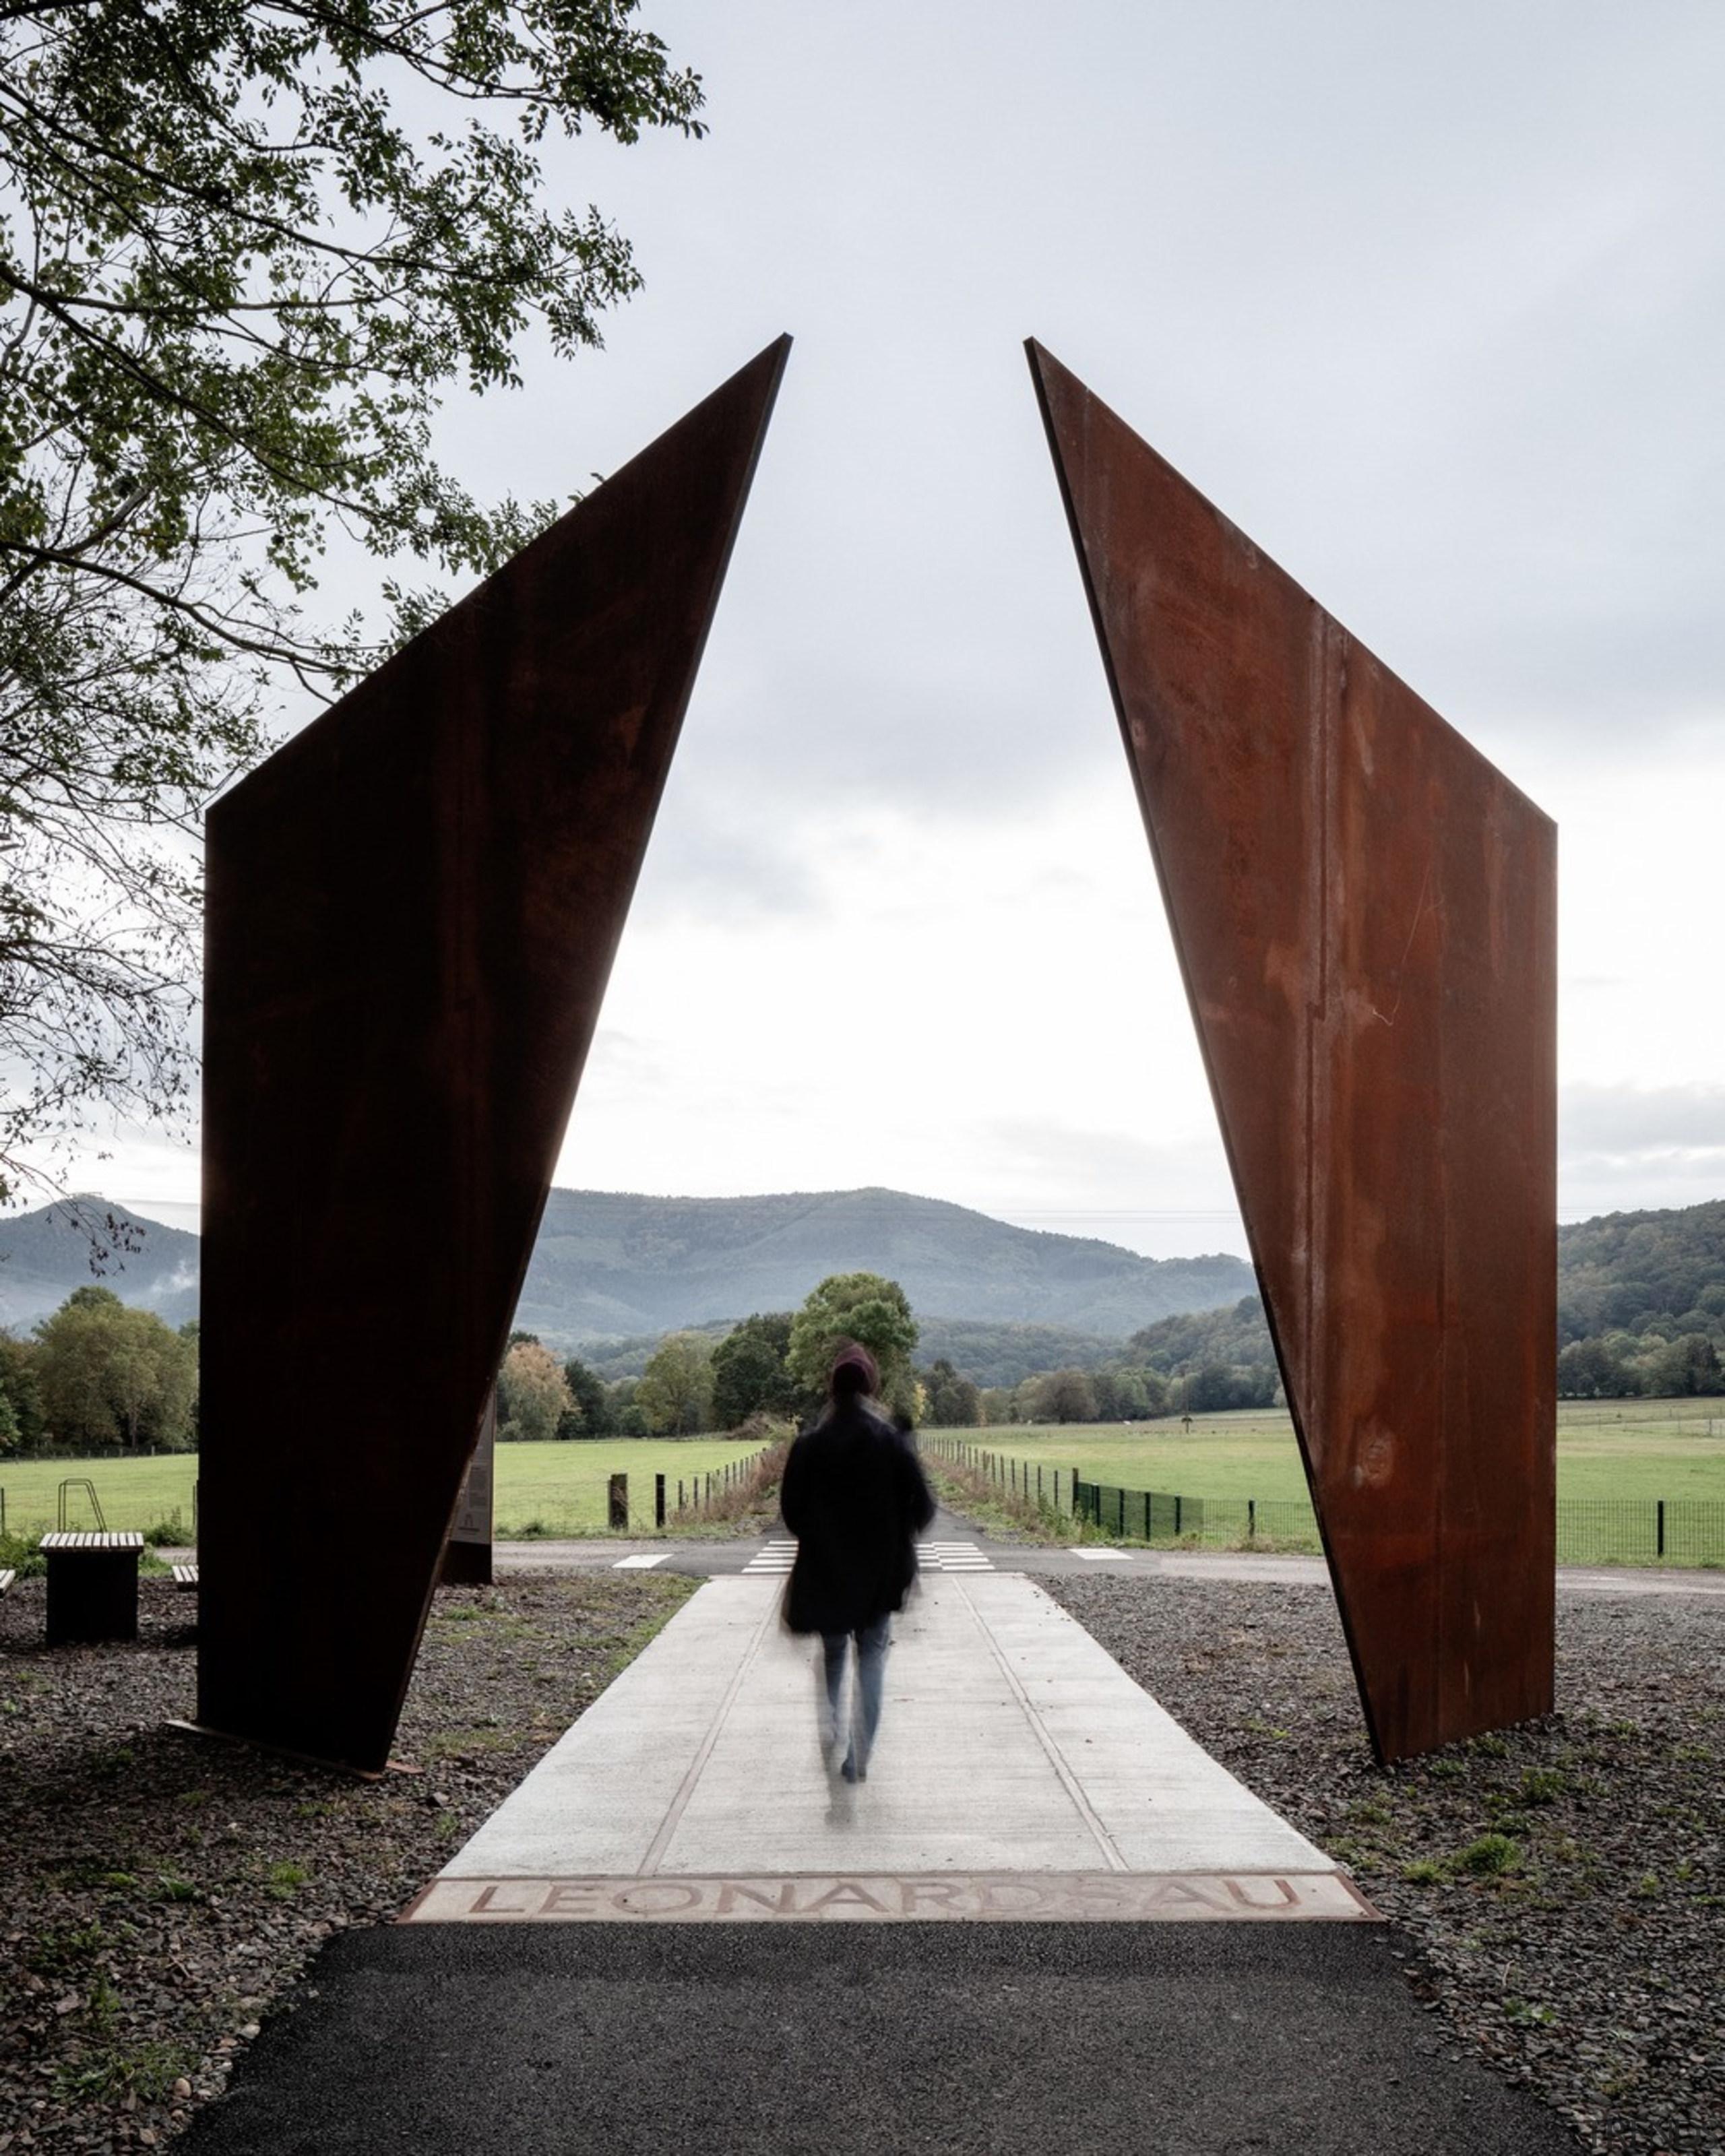 Corten steel 'gates' signal the end of a white, black